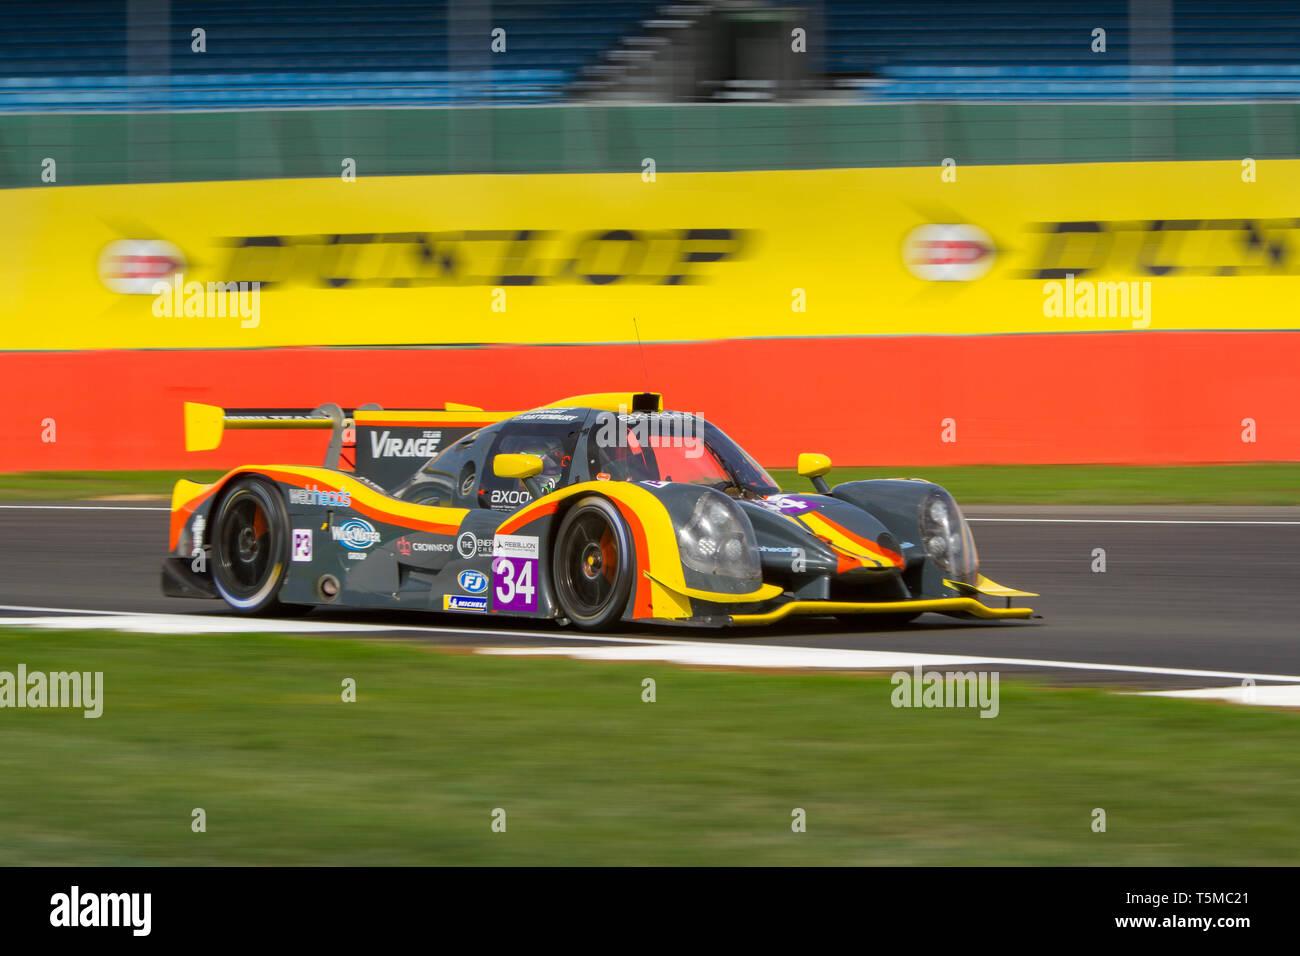 Team Virage Ligier JSP3 LMP3 car during the ELMS 4 Hours of Silverstone, 2018 Stock Photo